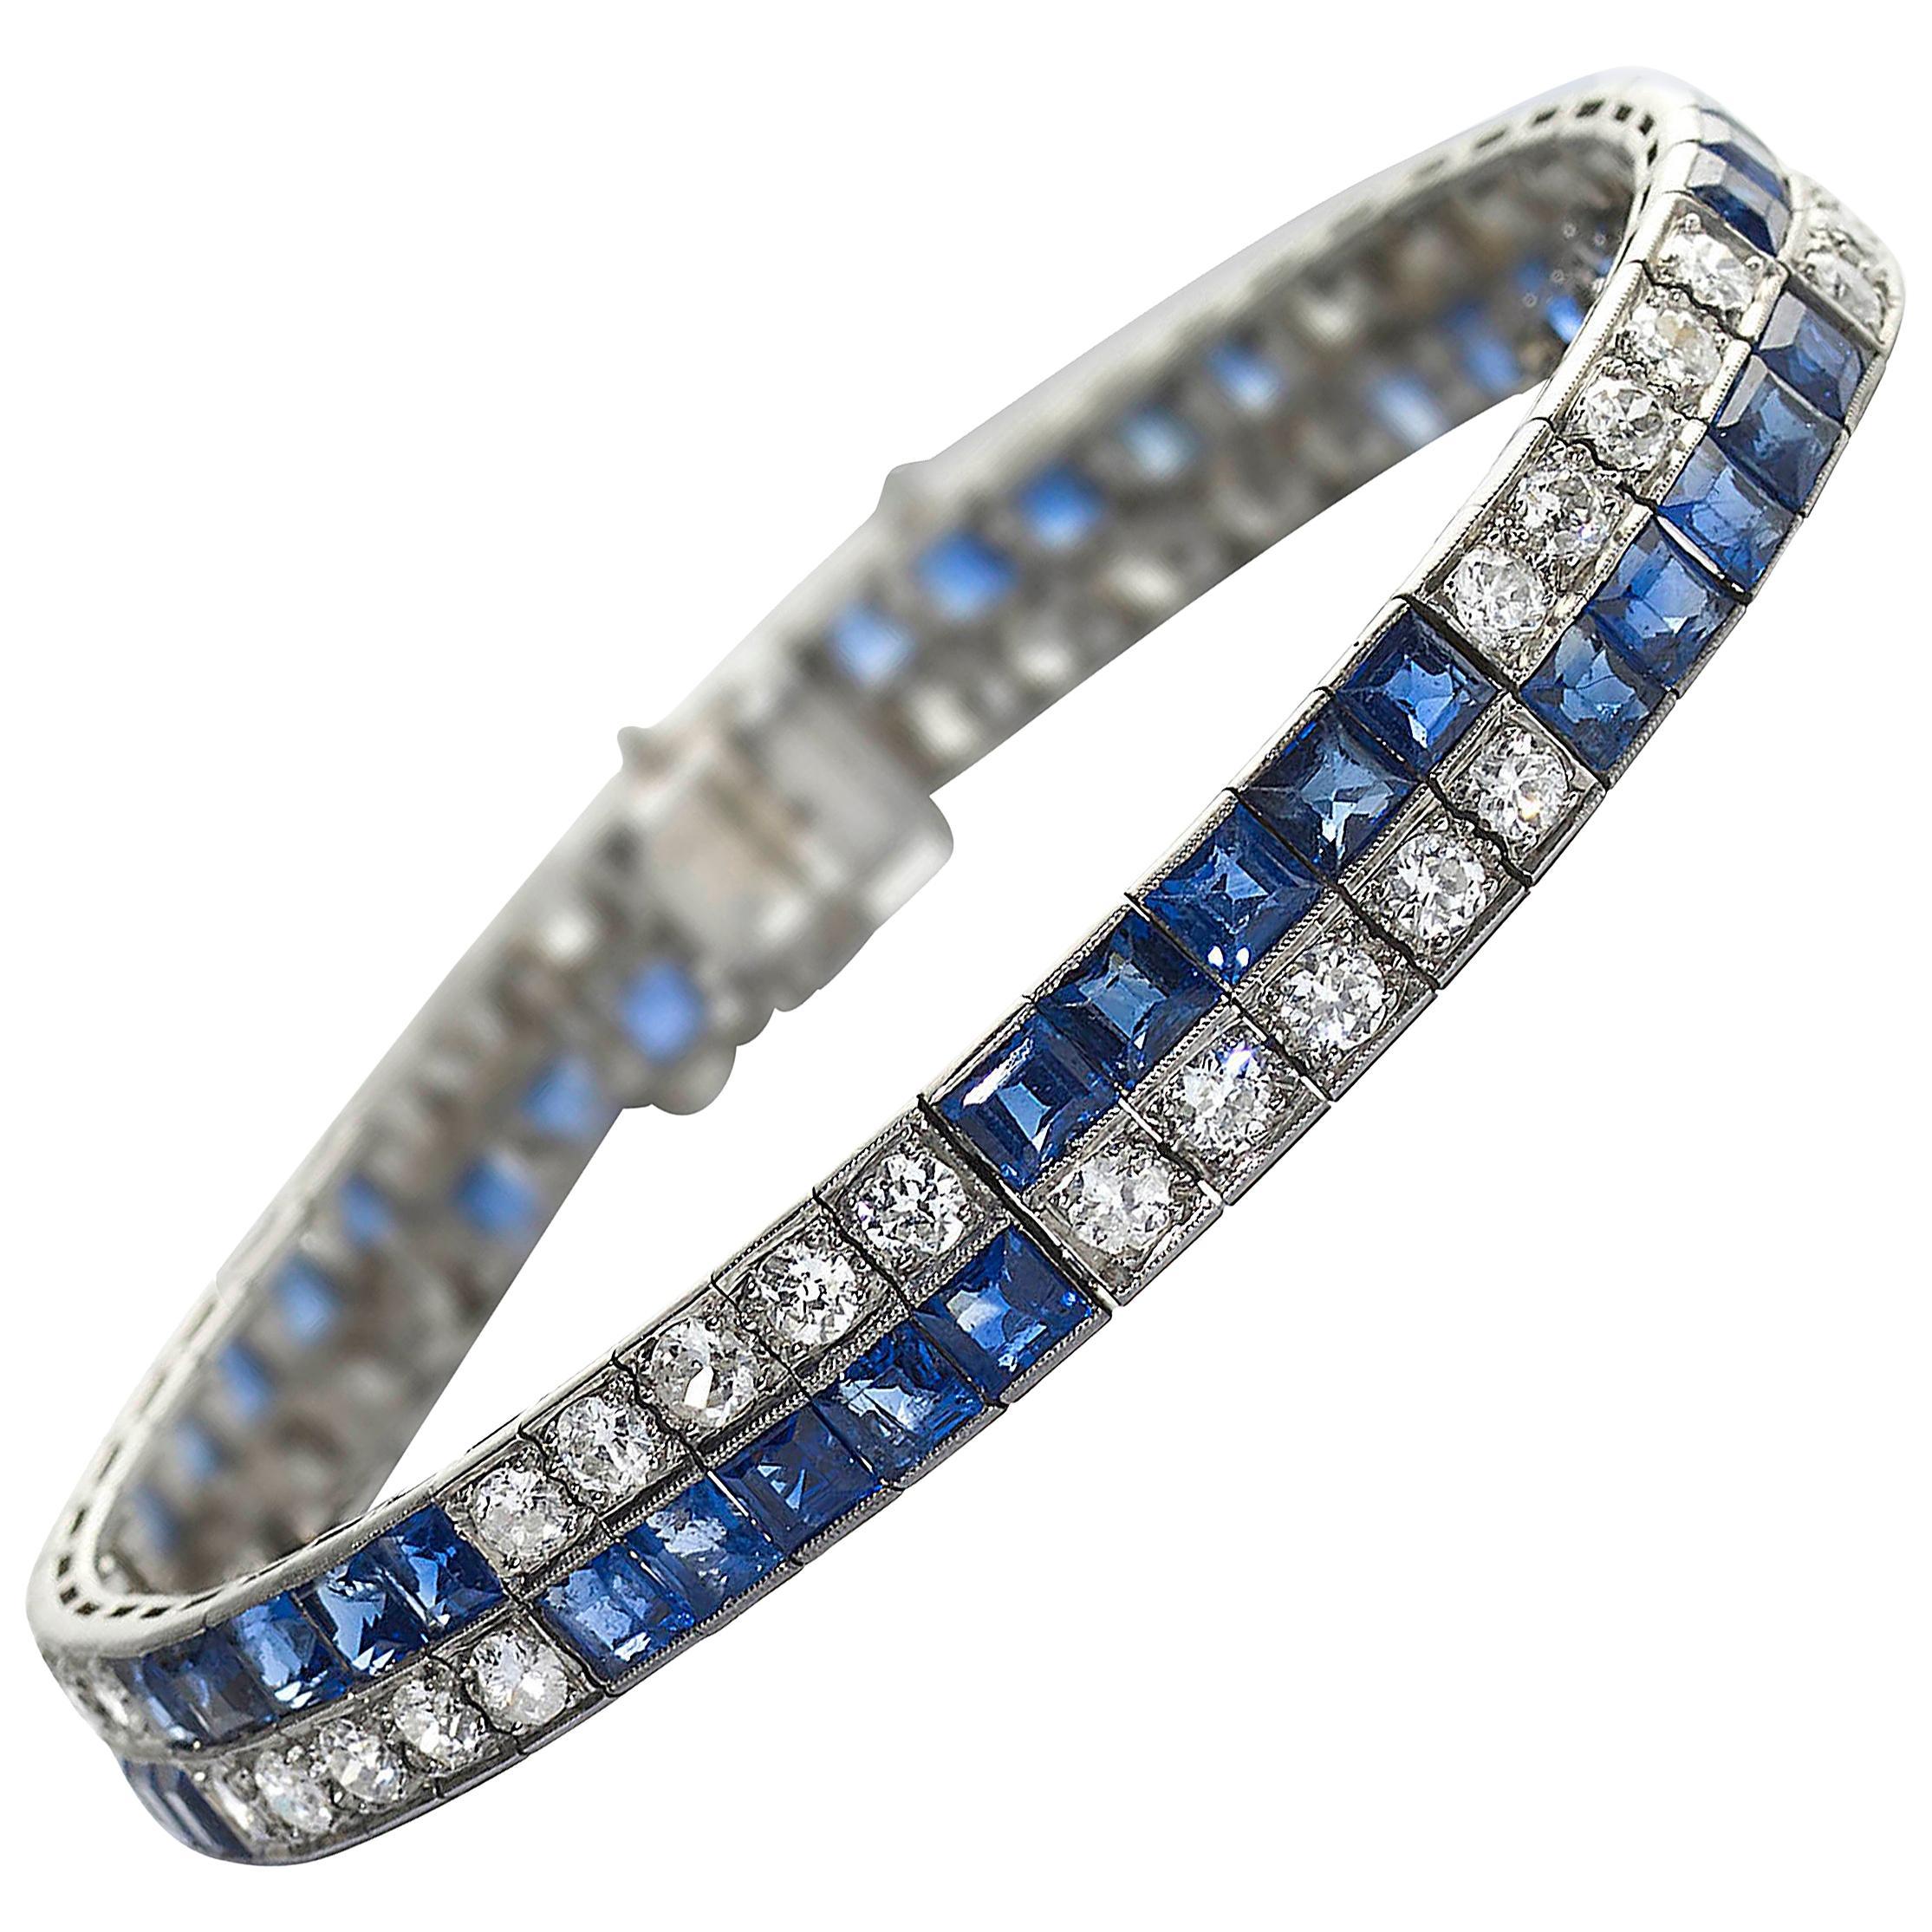 Art Deco Chaumet Sapphire Diamond and Platinum Bracelet, circa 1925